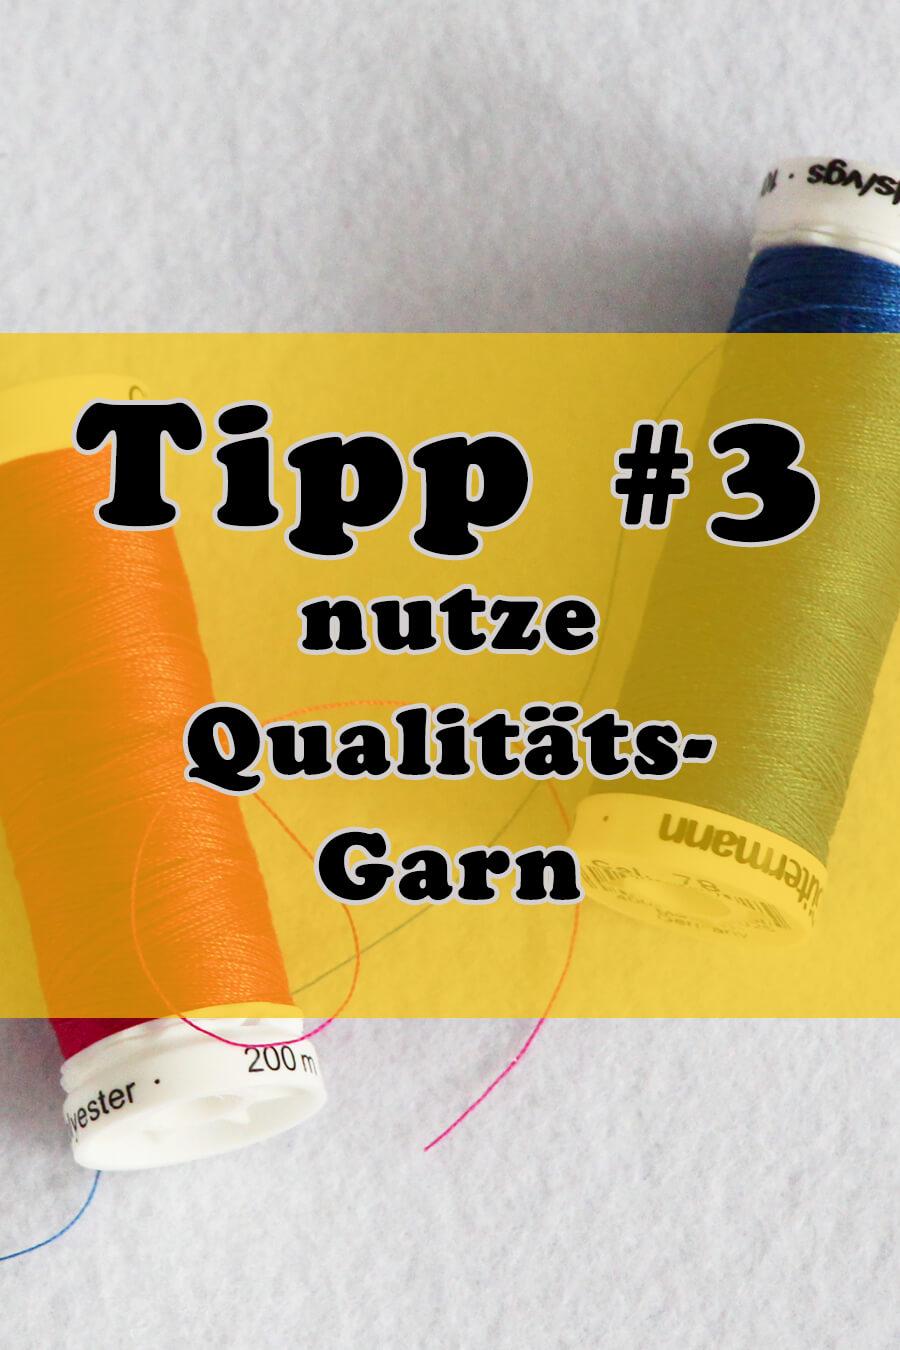 Tipp 3 nutze Qualitätsgarn